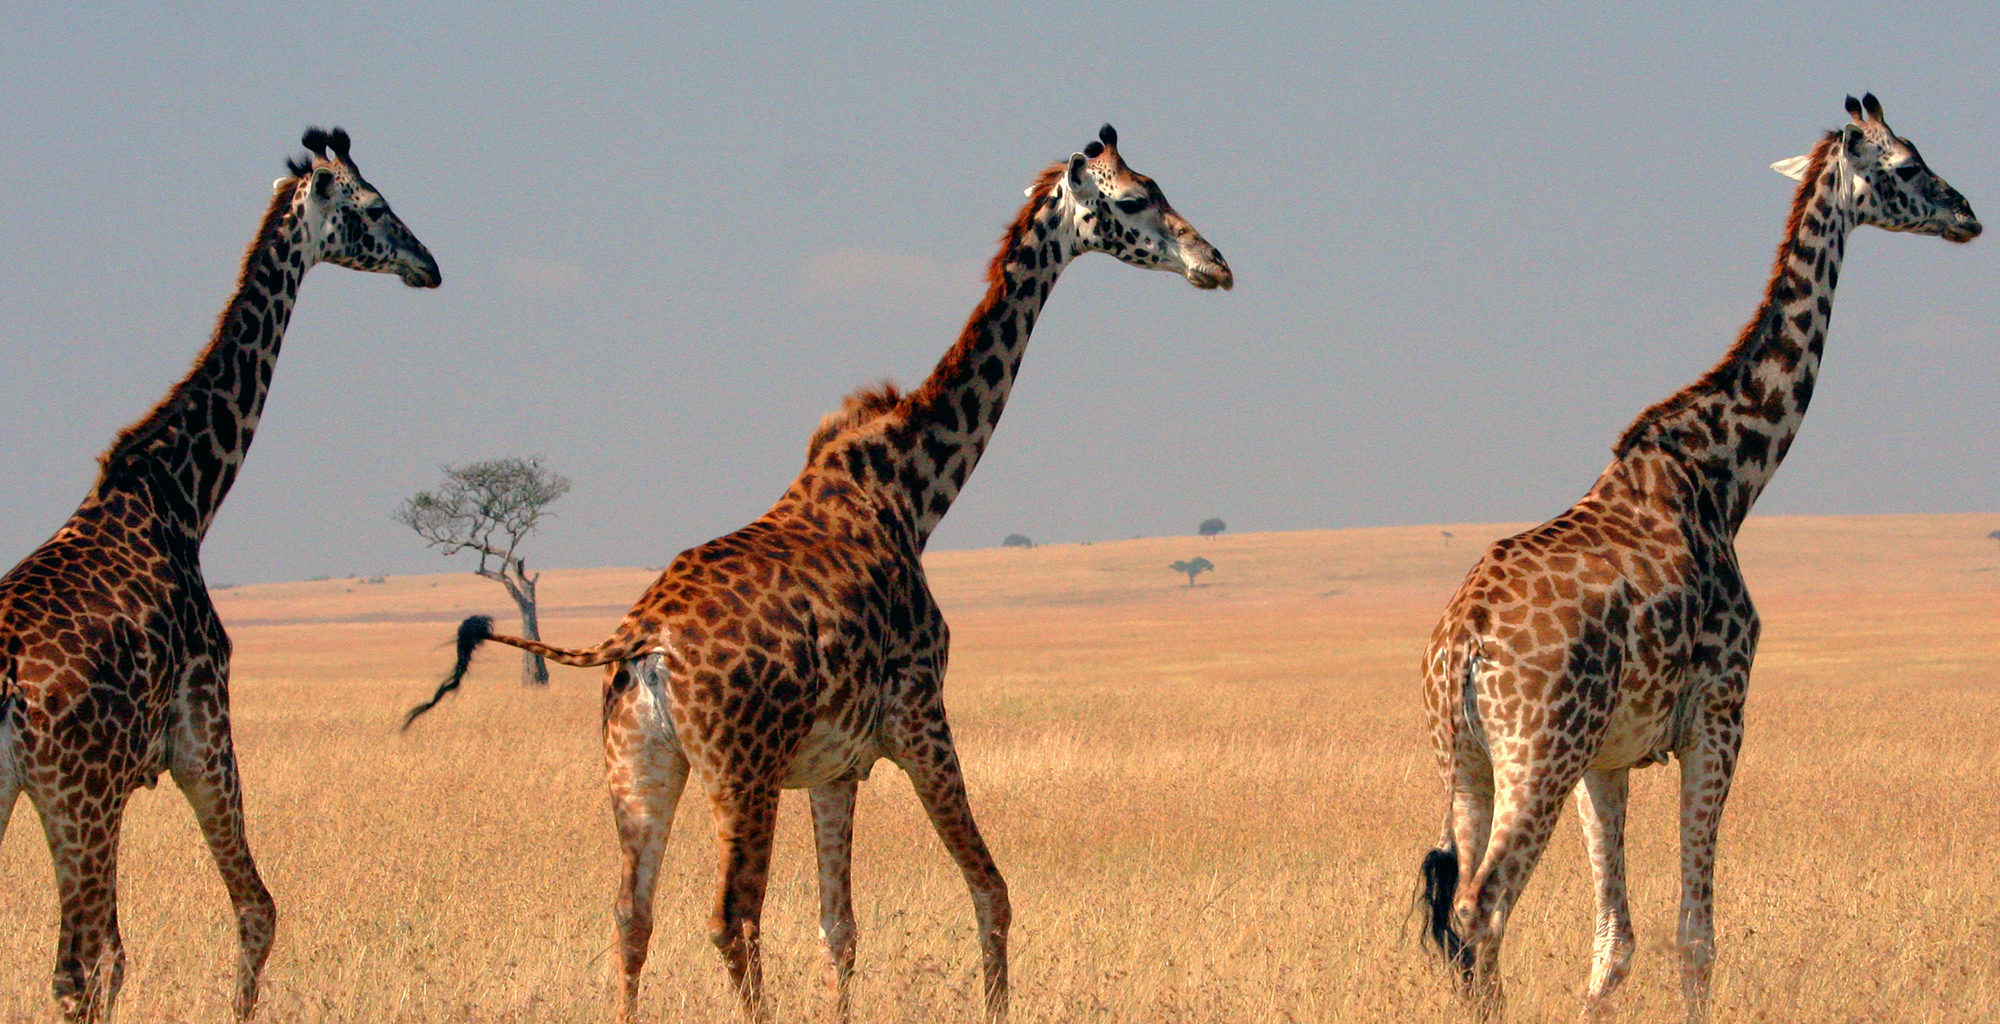 Kenya-Maasai-Mara-Wildlife-Giraffe